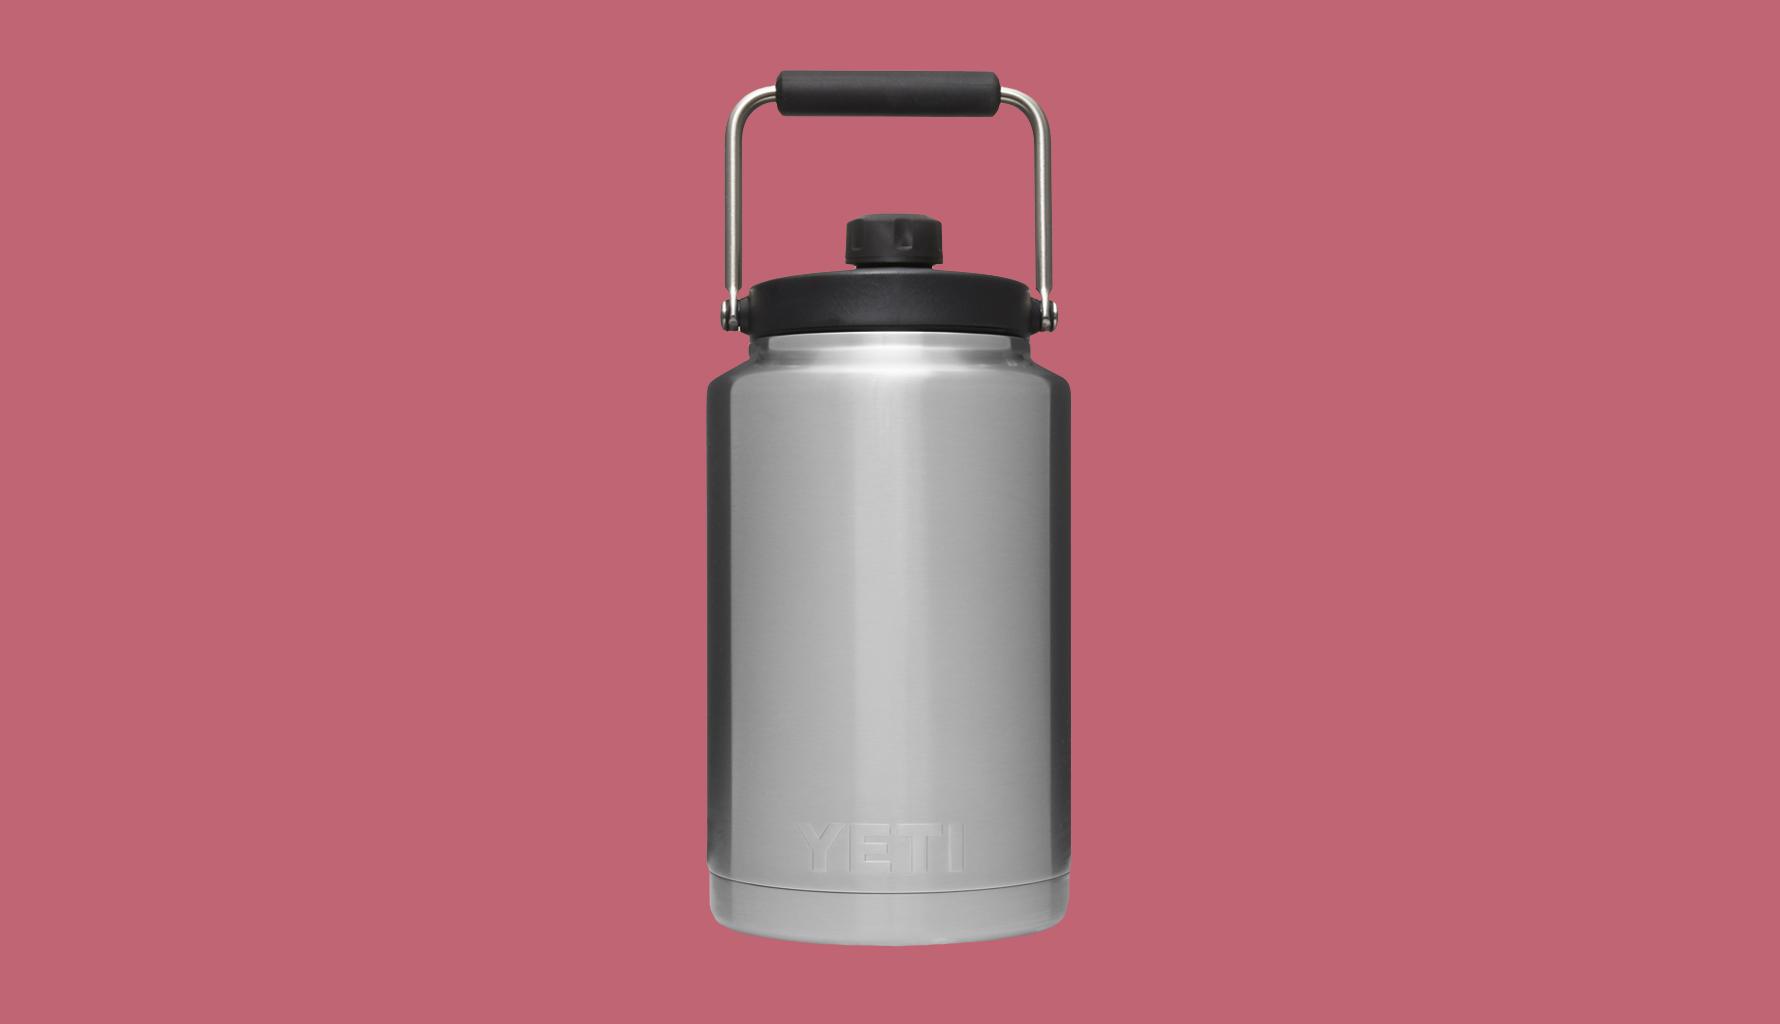 Yeti Stainless Steel Gallon Jug